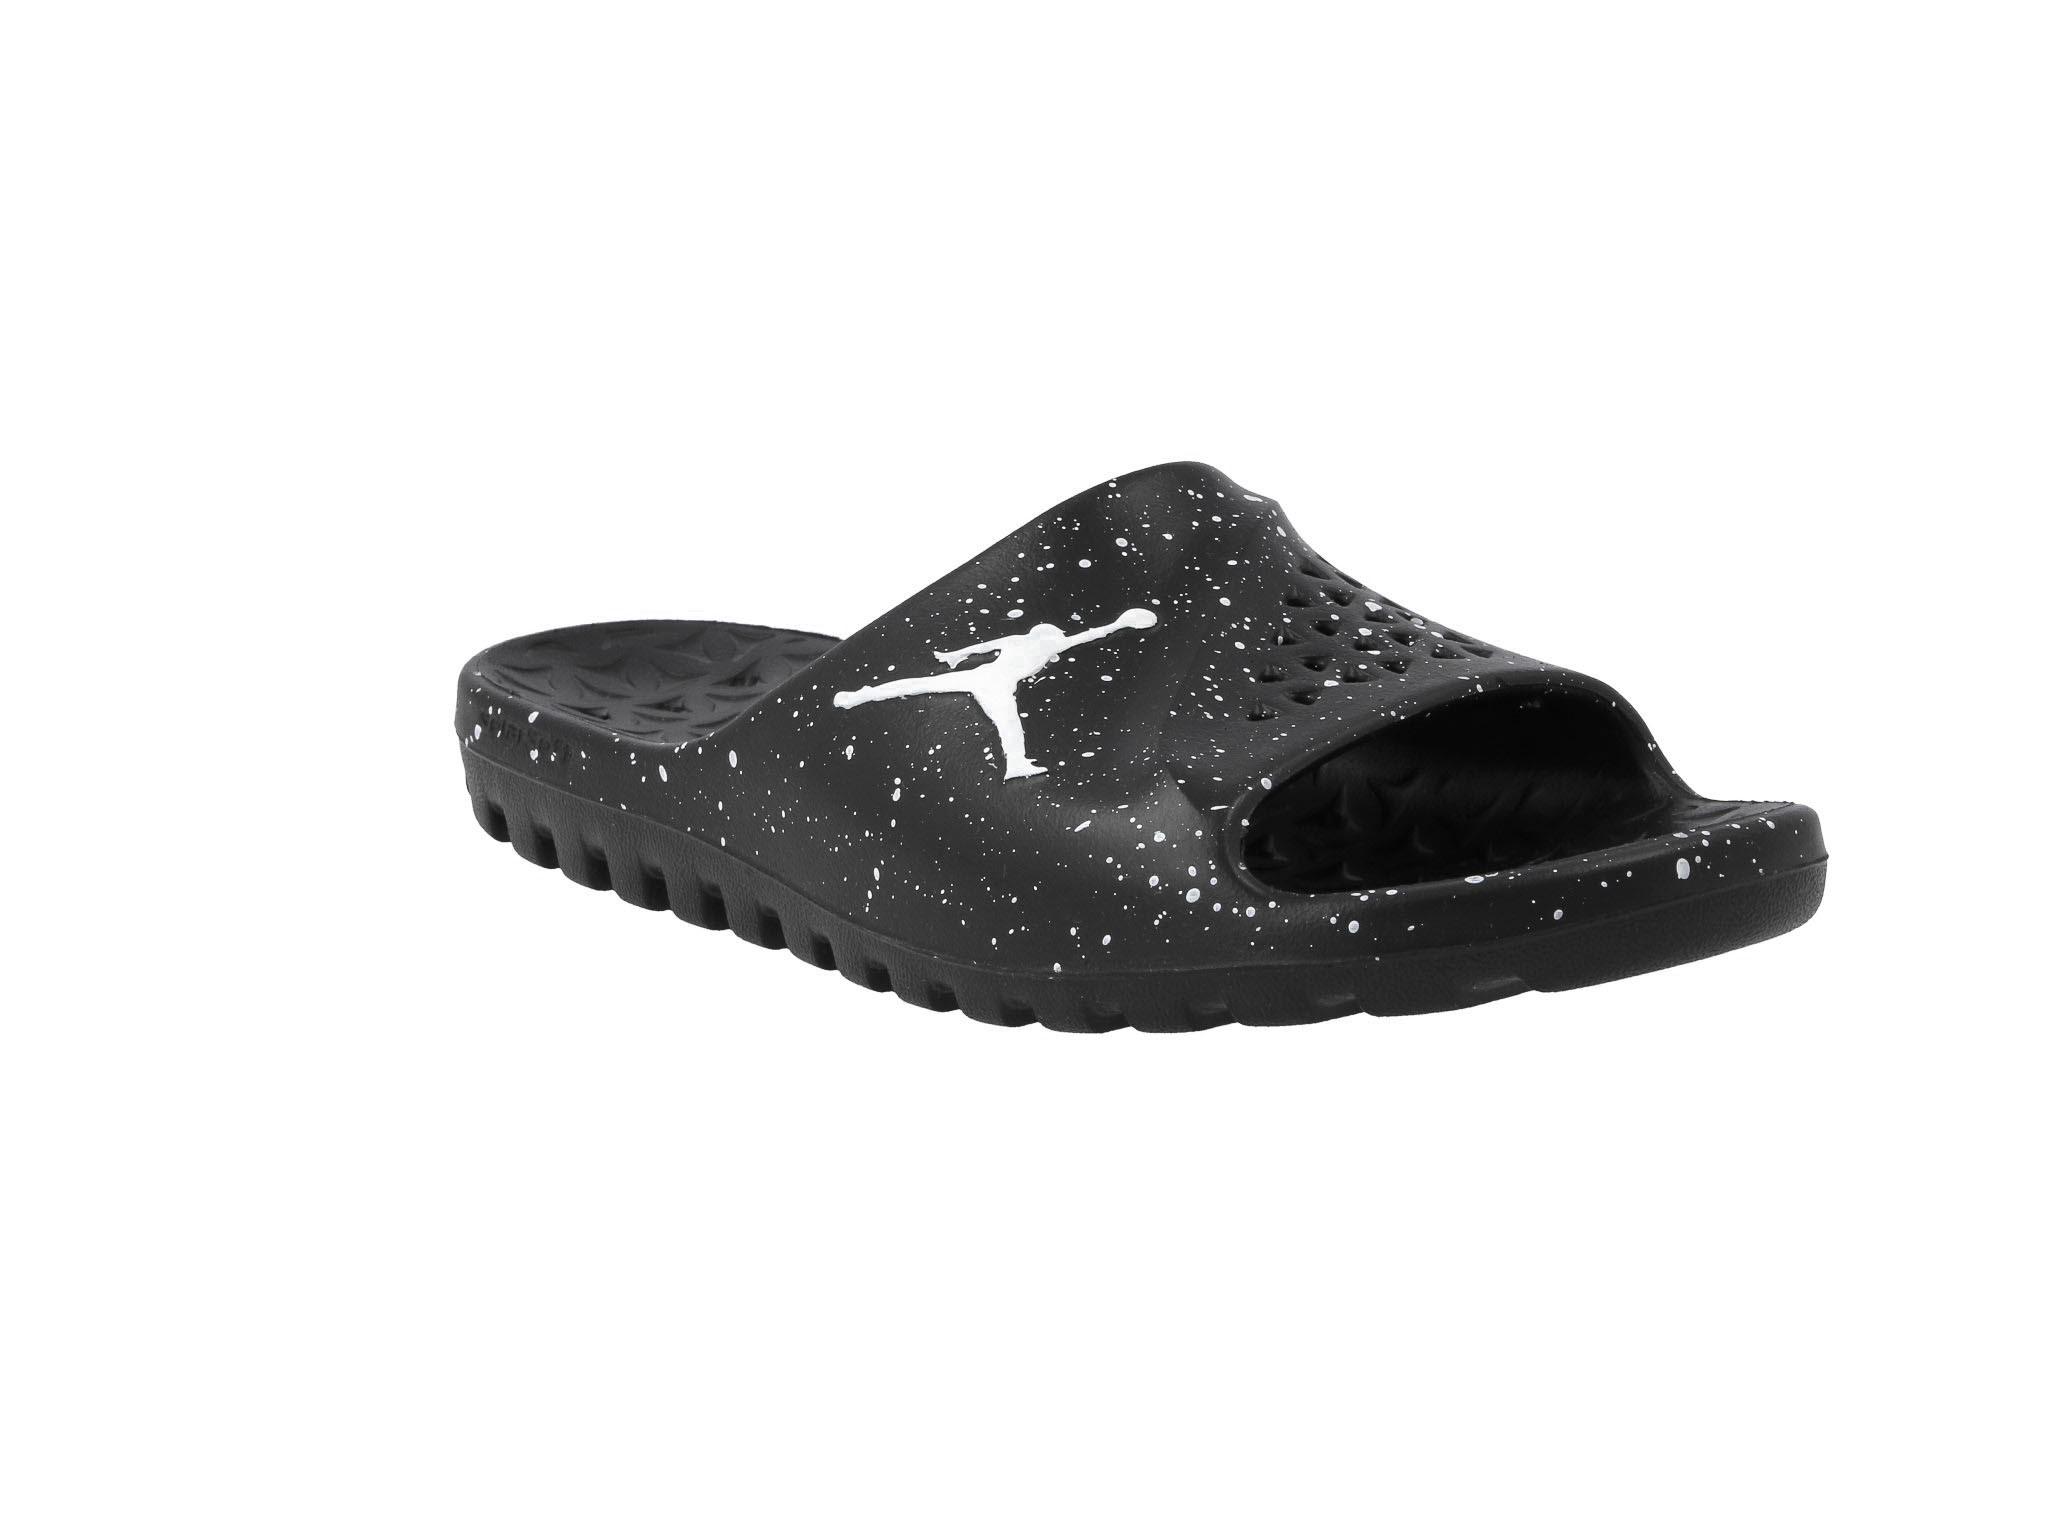 Papucs NIKE Jordan Super.Fly Team Slide 716985 031 BlackWhiteWhite